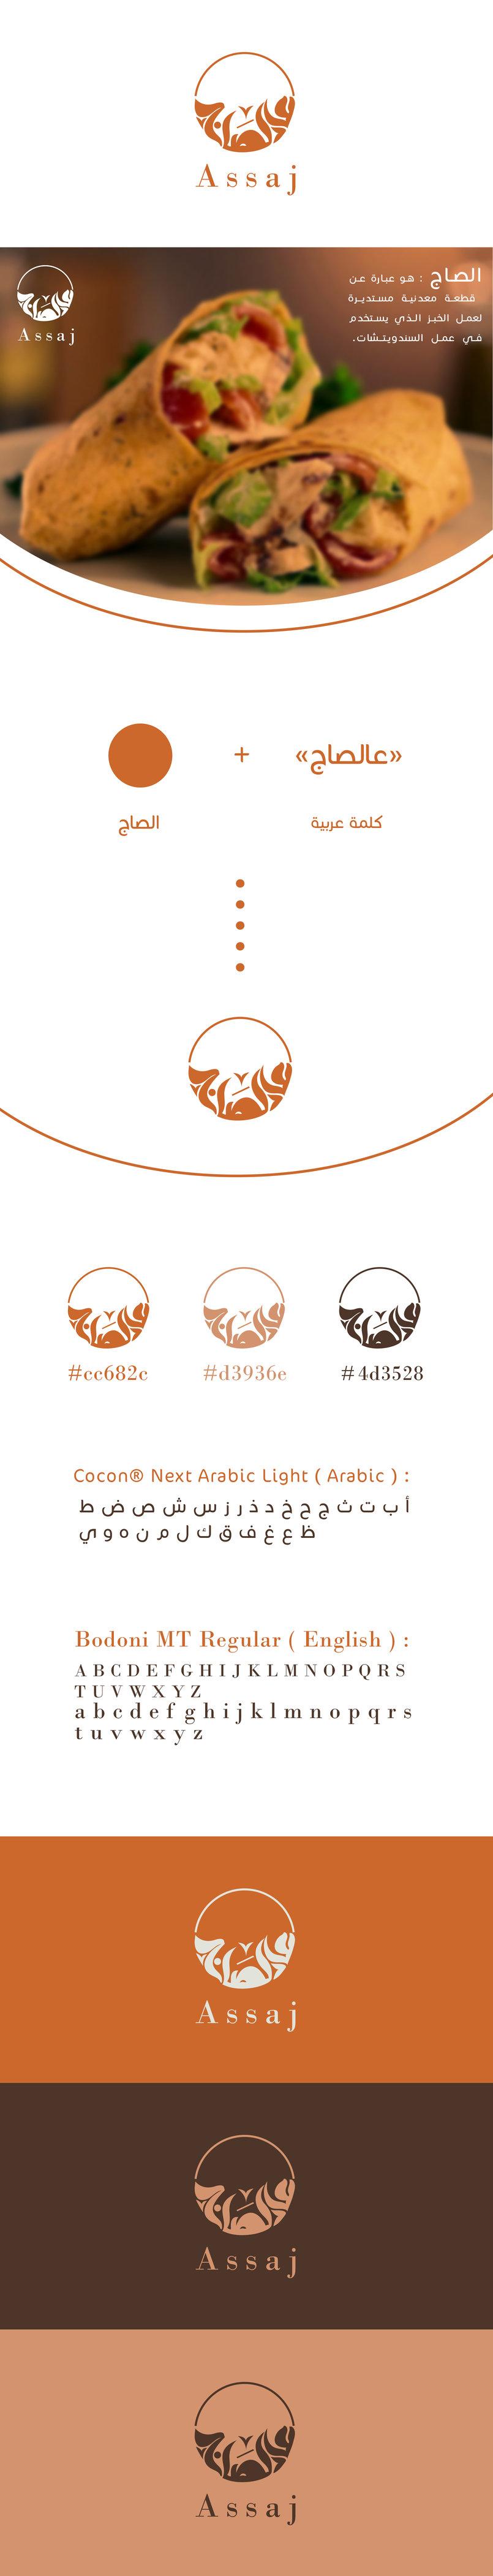 Assj - عالصاج